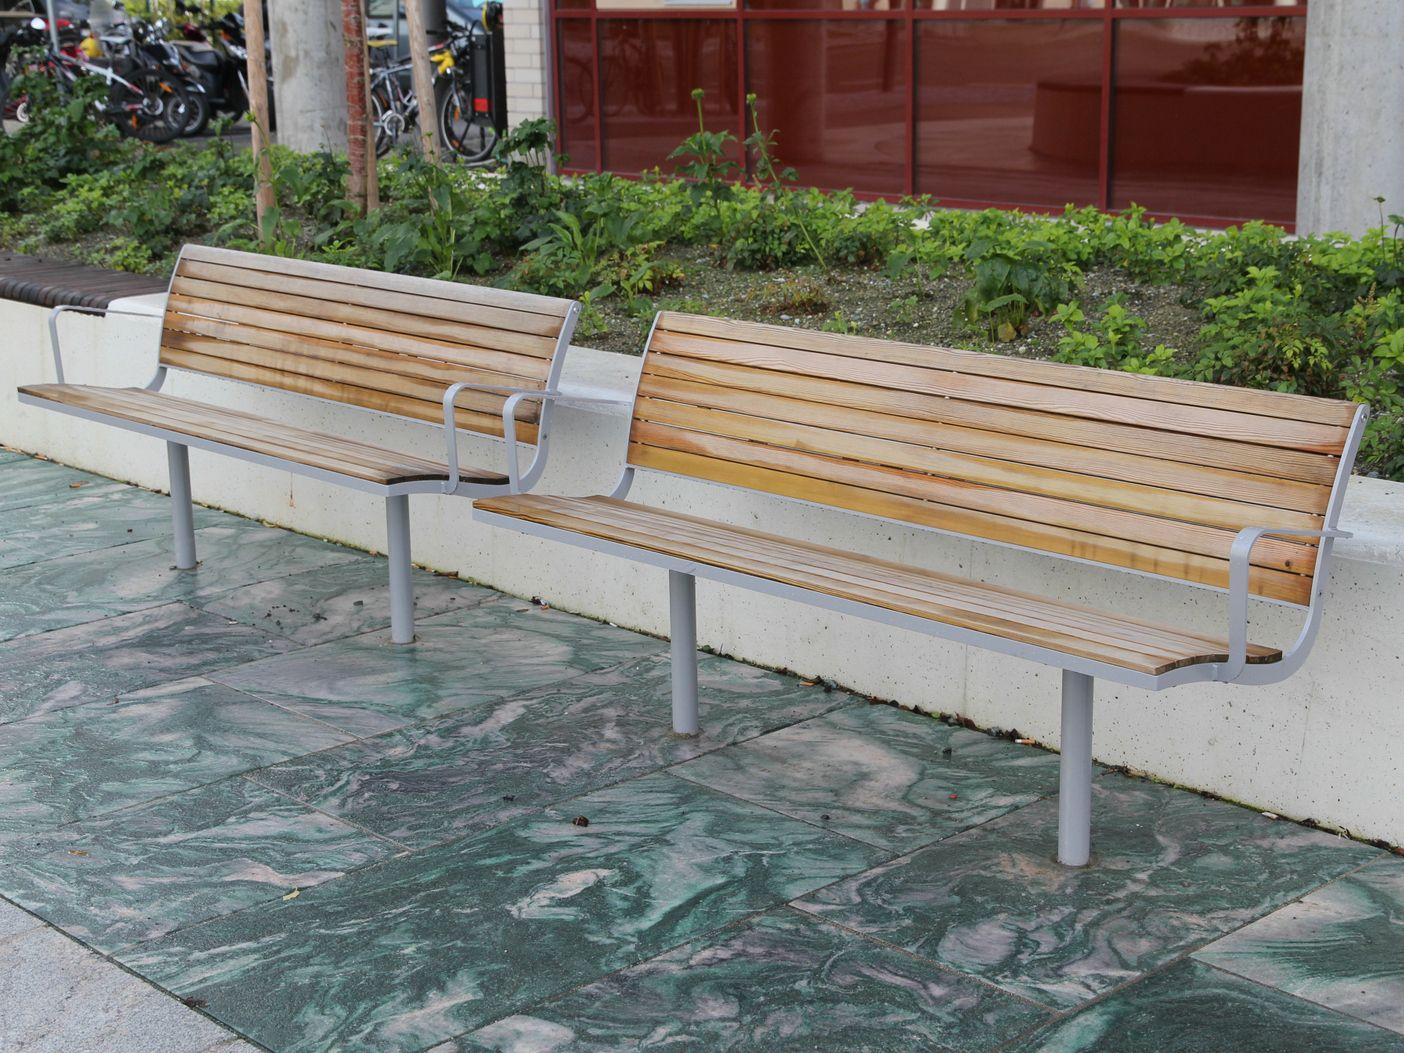 Parco panchina in acciaio e legno by nola industrier for Panchine arredo urbano prezzi